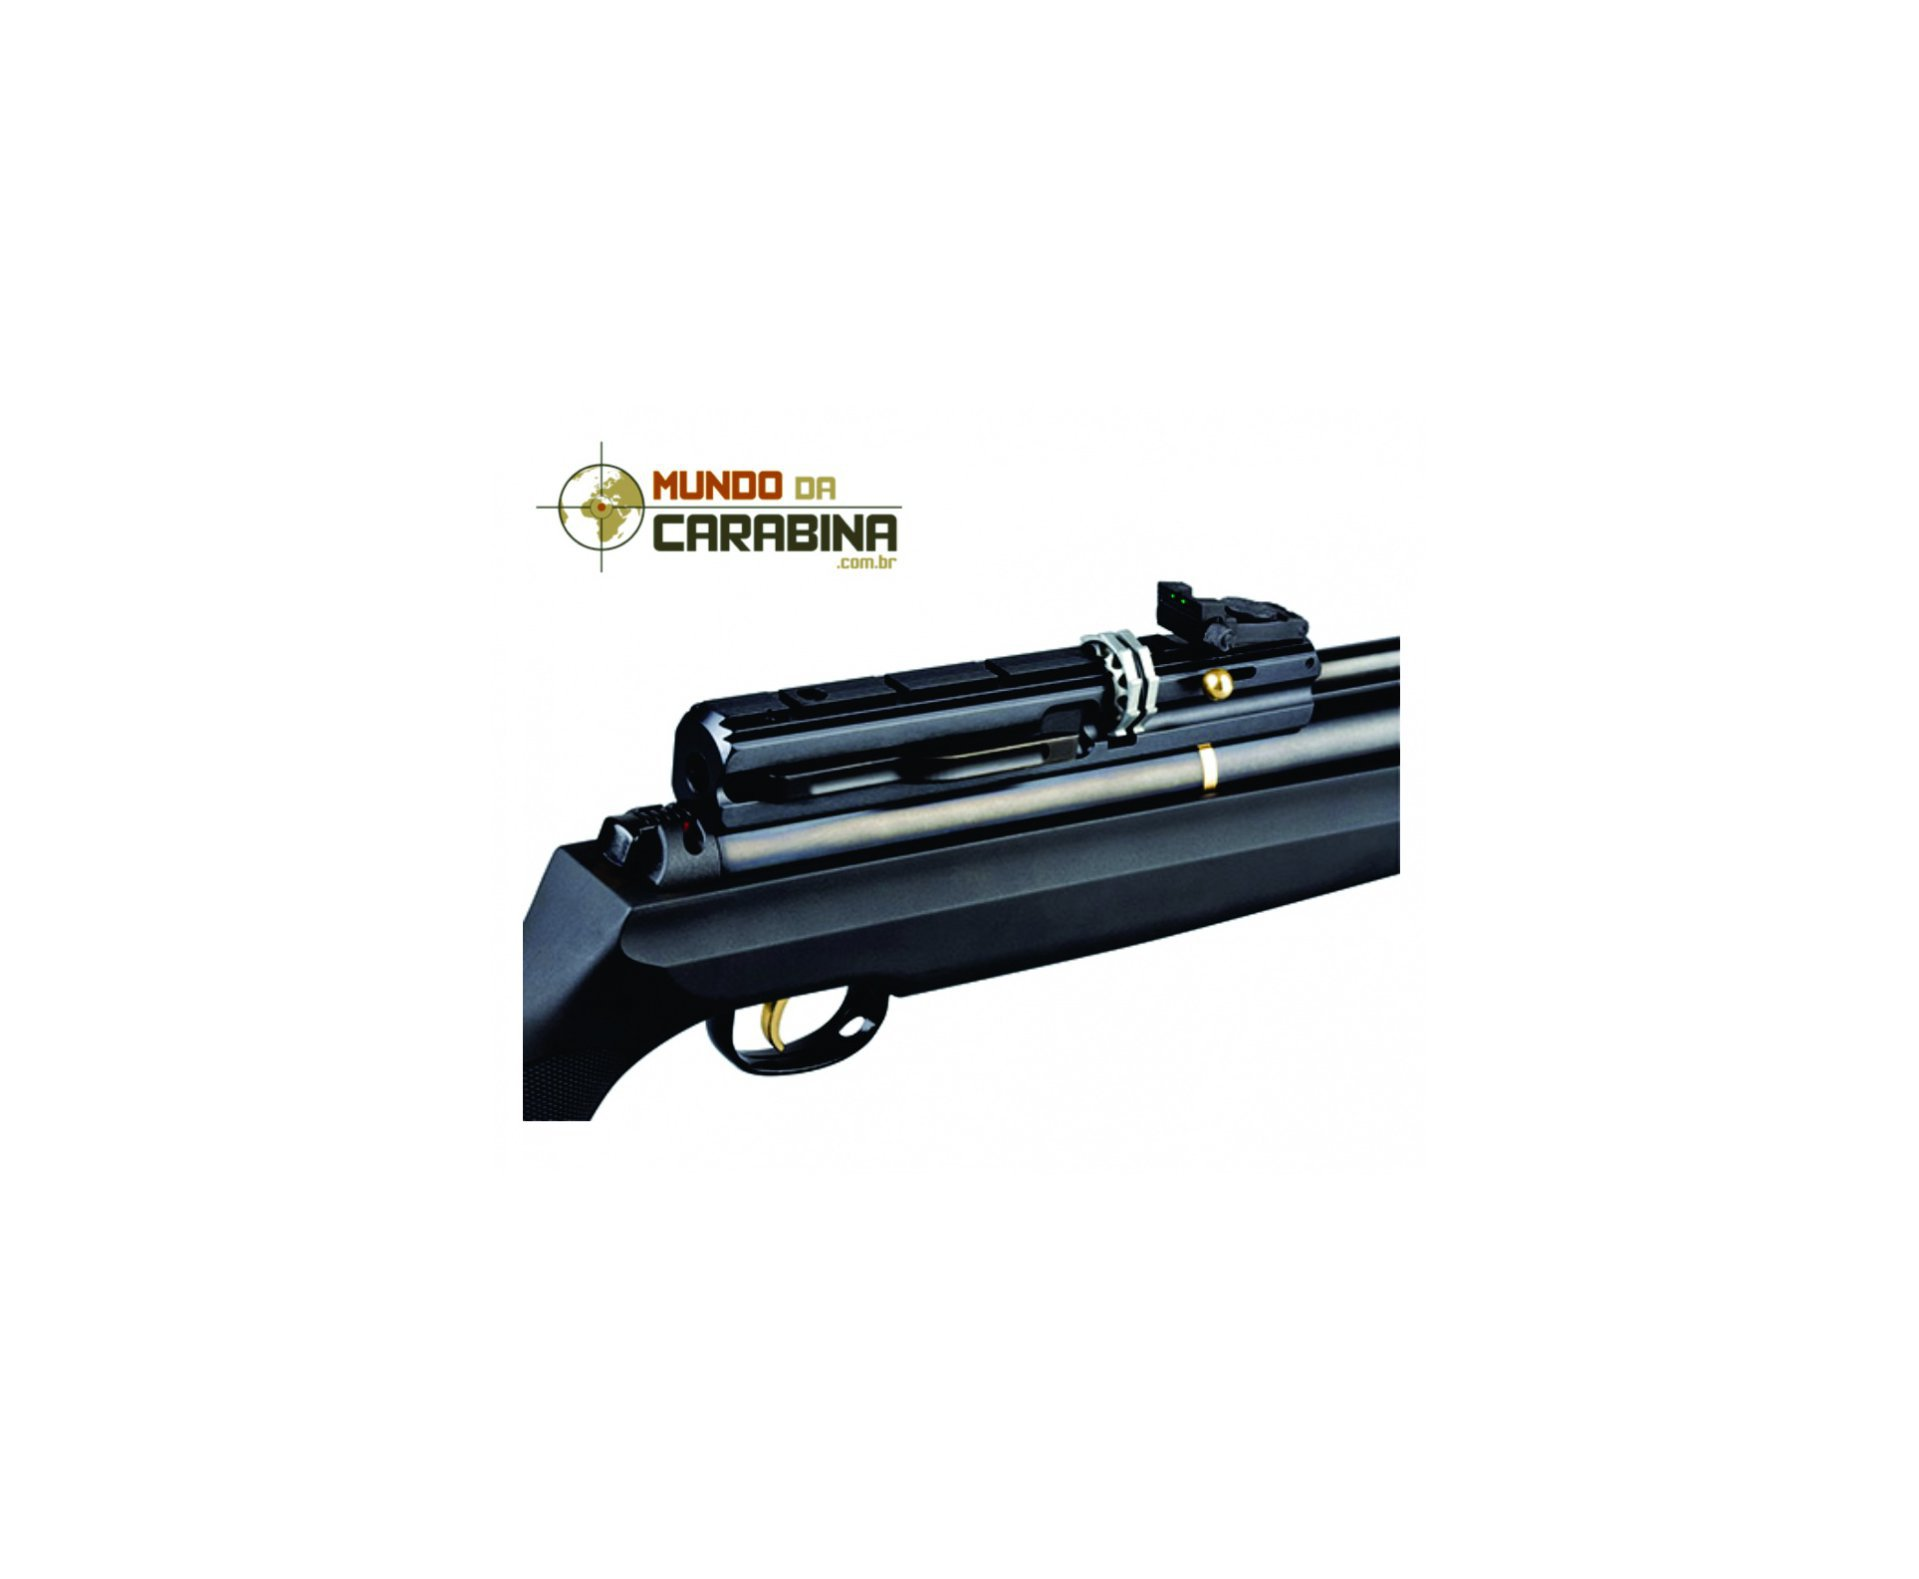 Carabina Pcp Hatsan At44-10- Calibre 5,5 Mm + Capa + Bomba Pneumática Hatsan